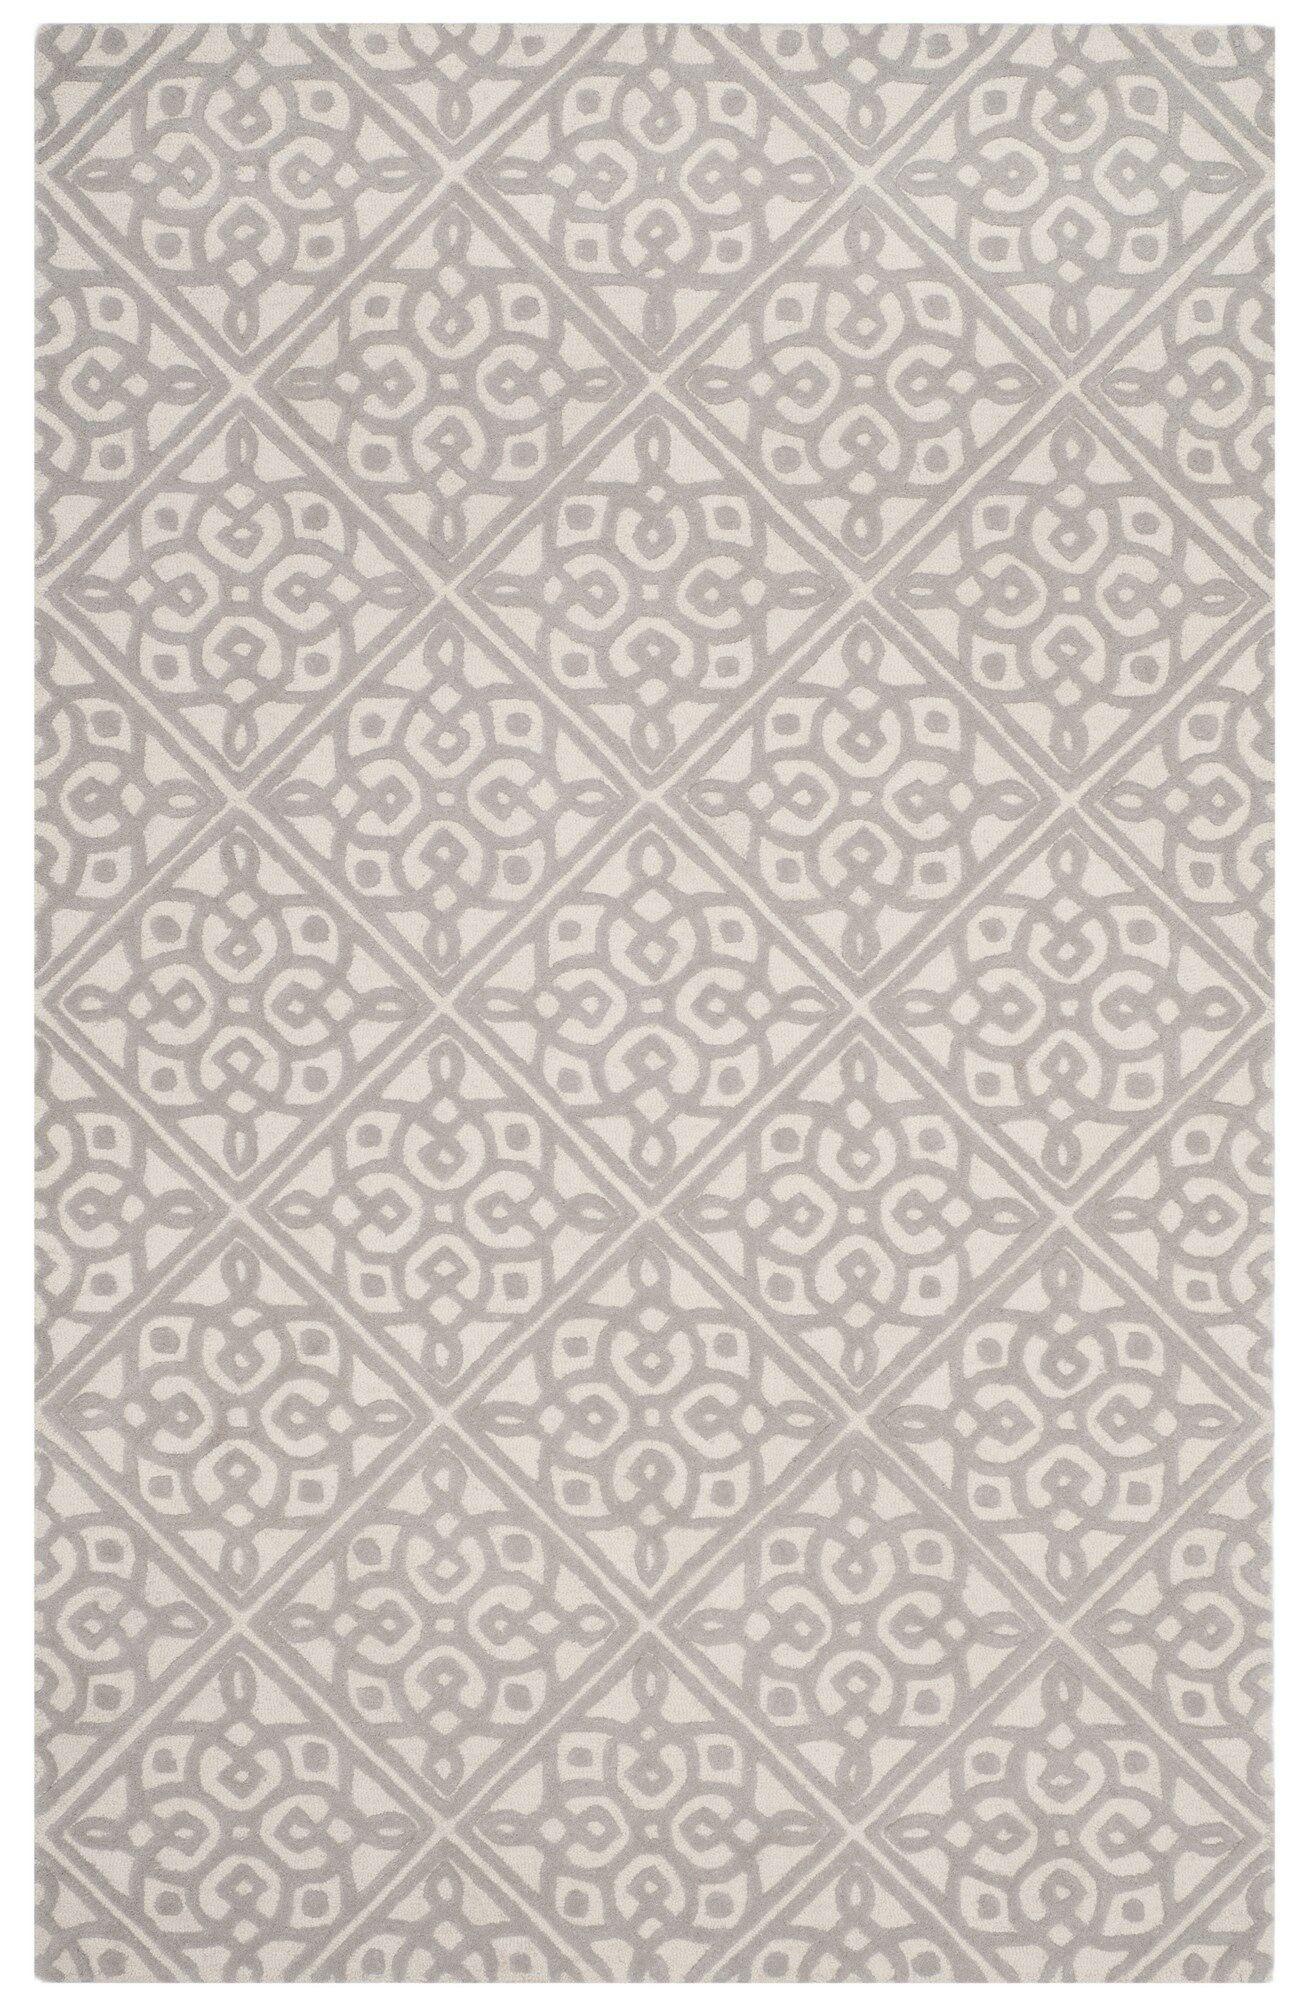 Mahoney Hand-Tufted Ivory/Gray Area Rug Rug Size: Rectangle 5' x 8'